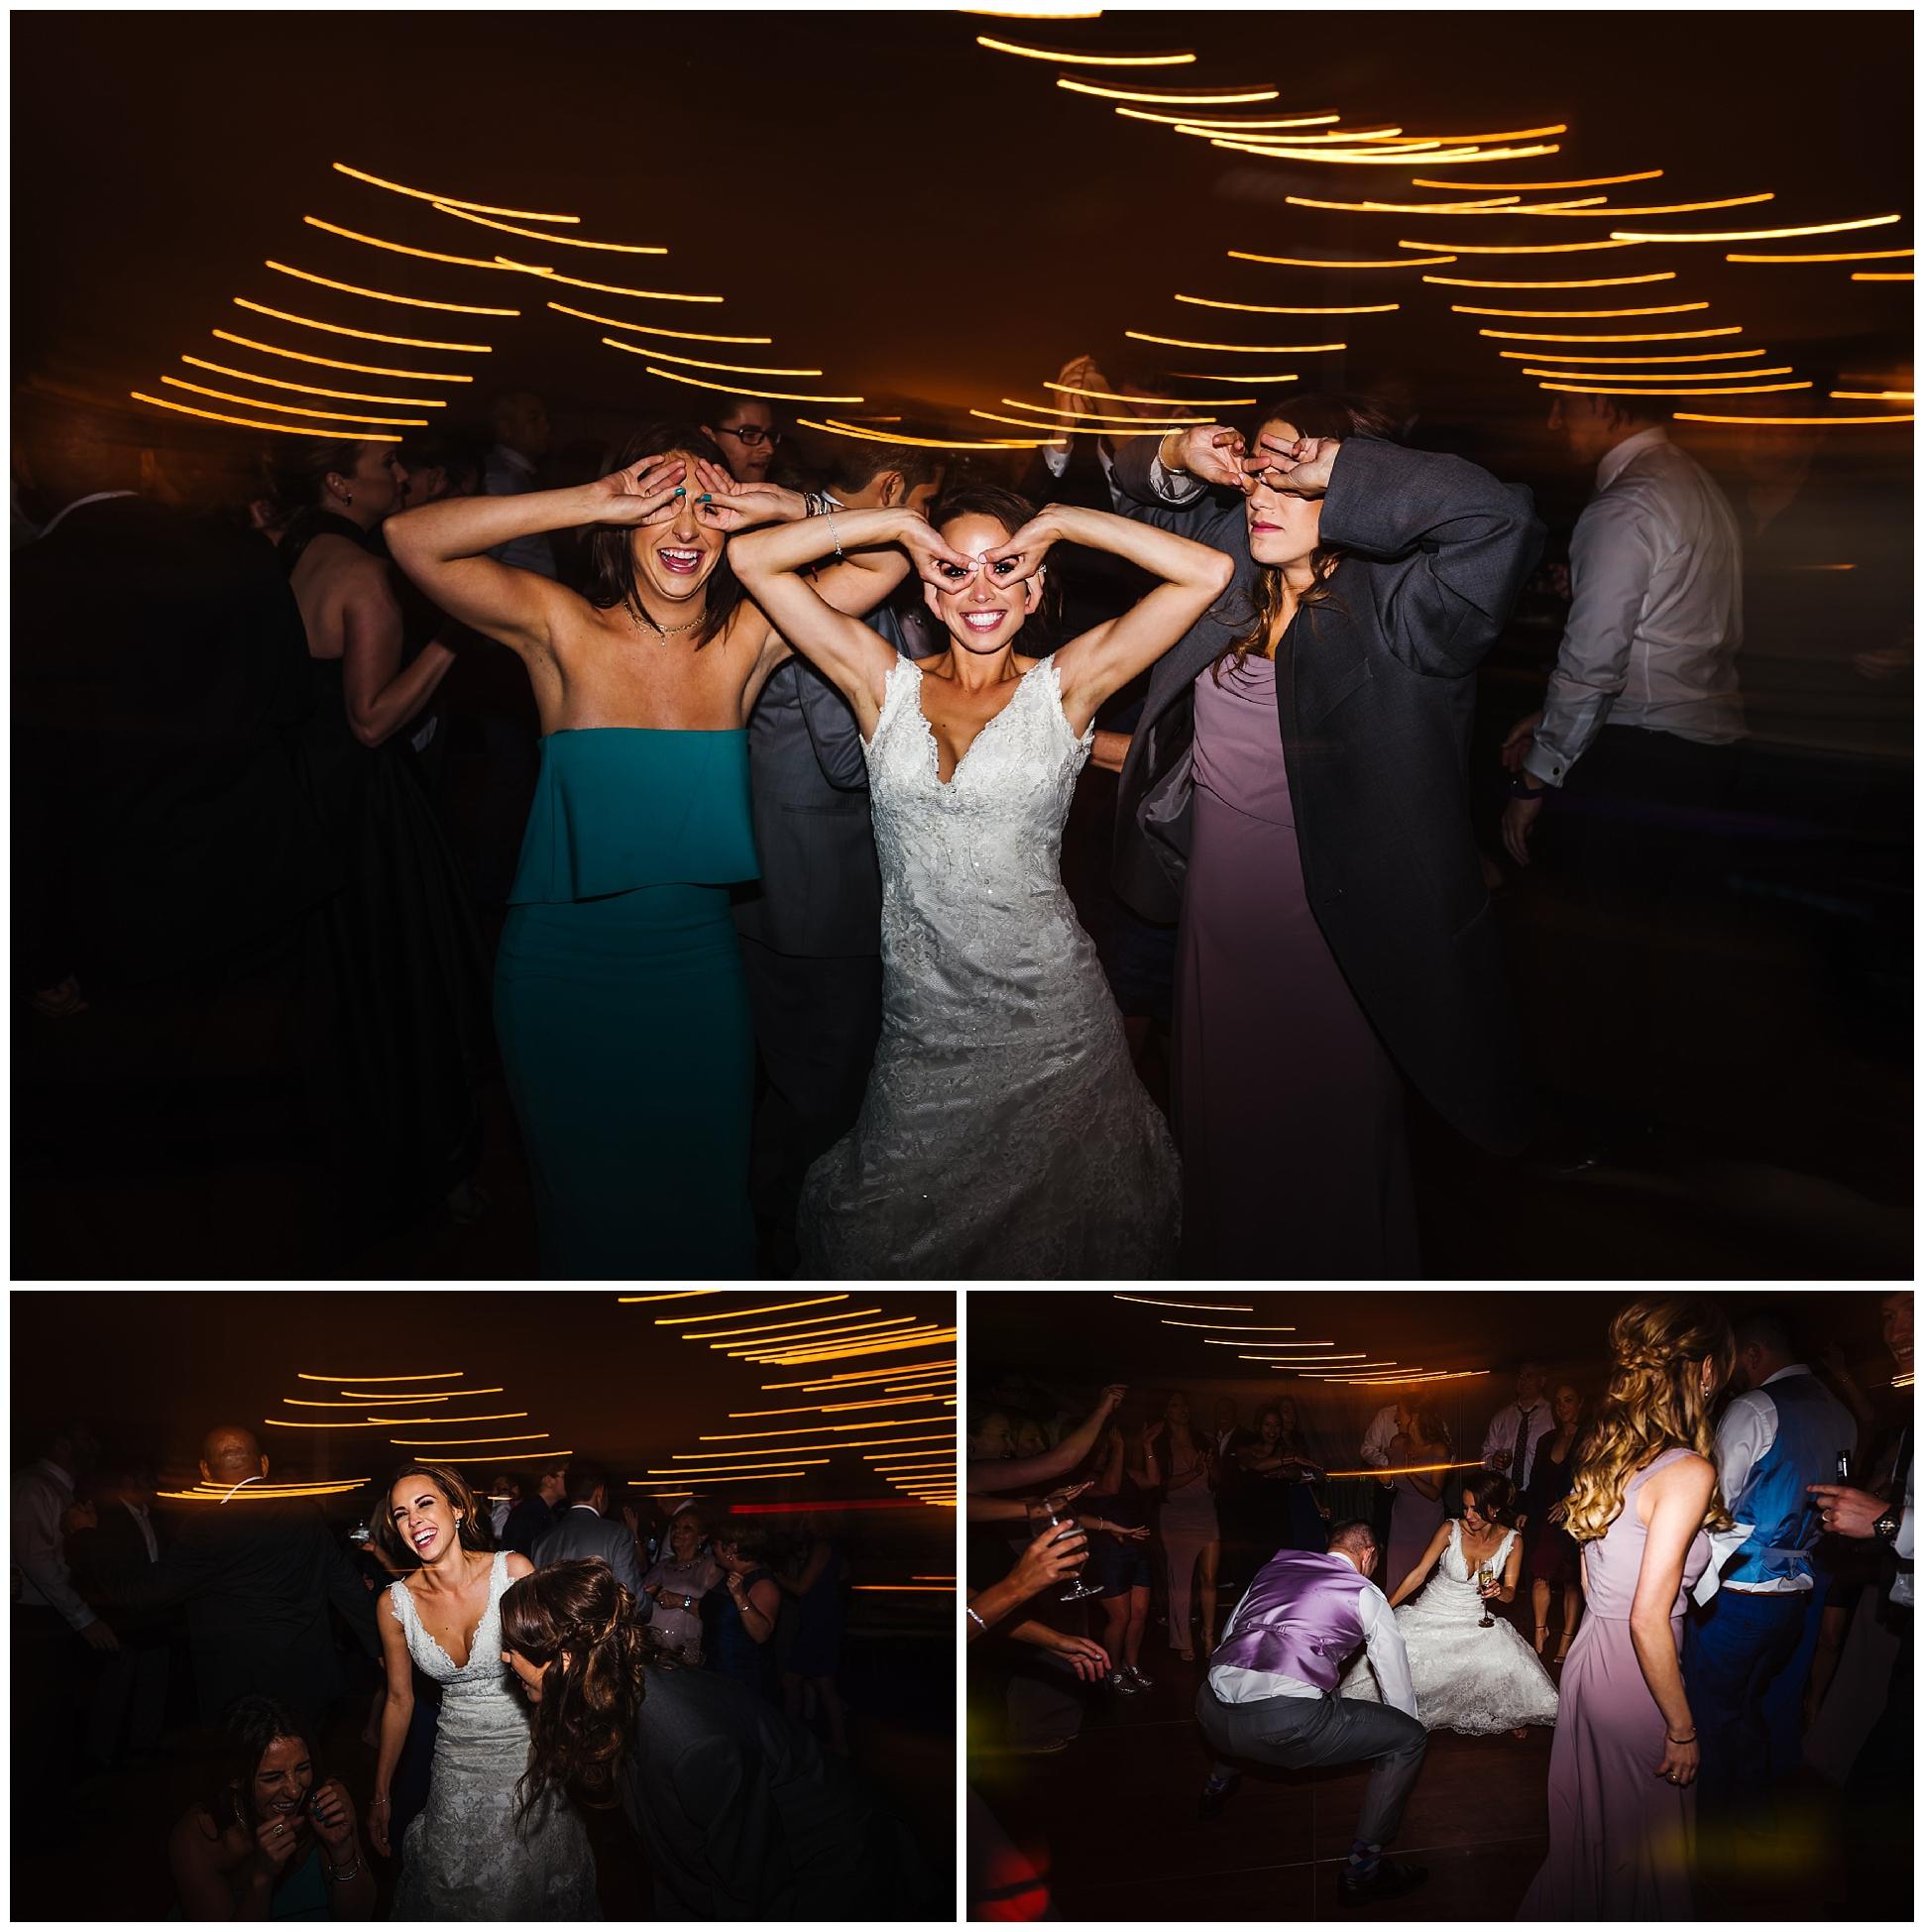 Tampa-luxury-wedding-photographer-mision-lago-private-estate_0060.jpg